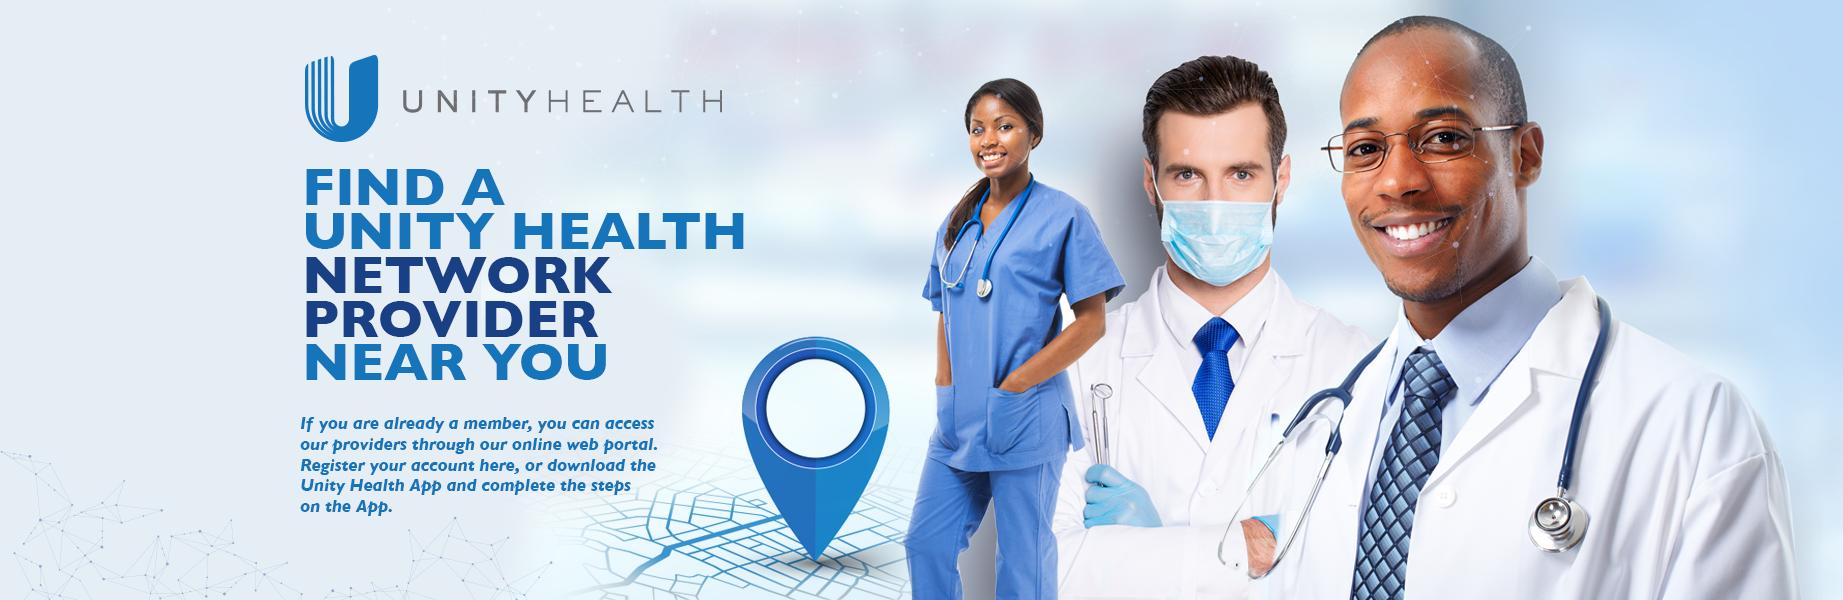 Unity Health network doctors